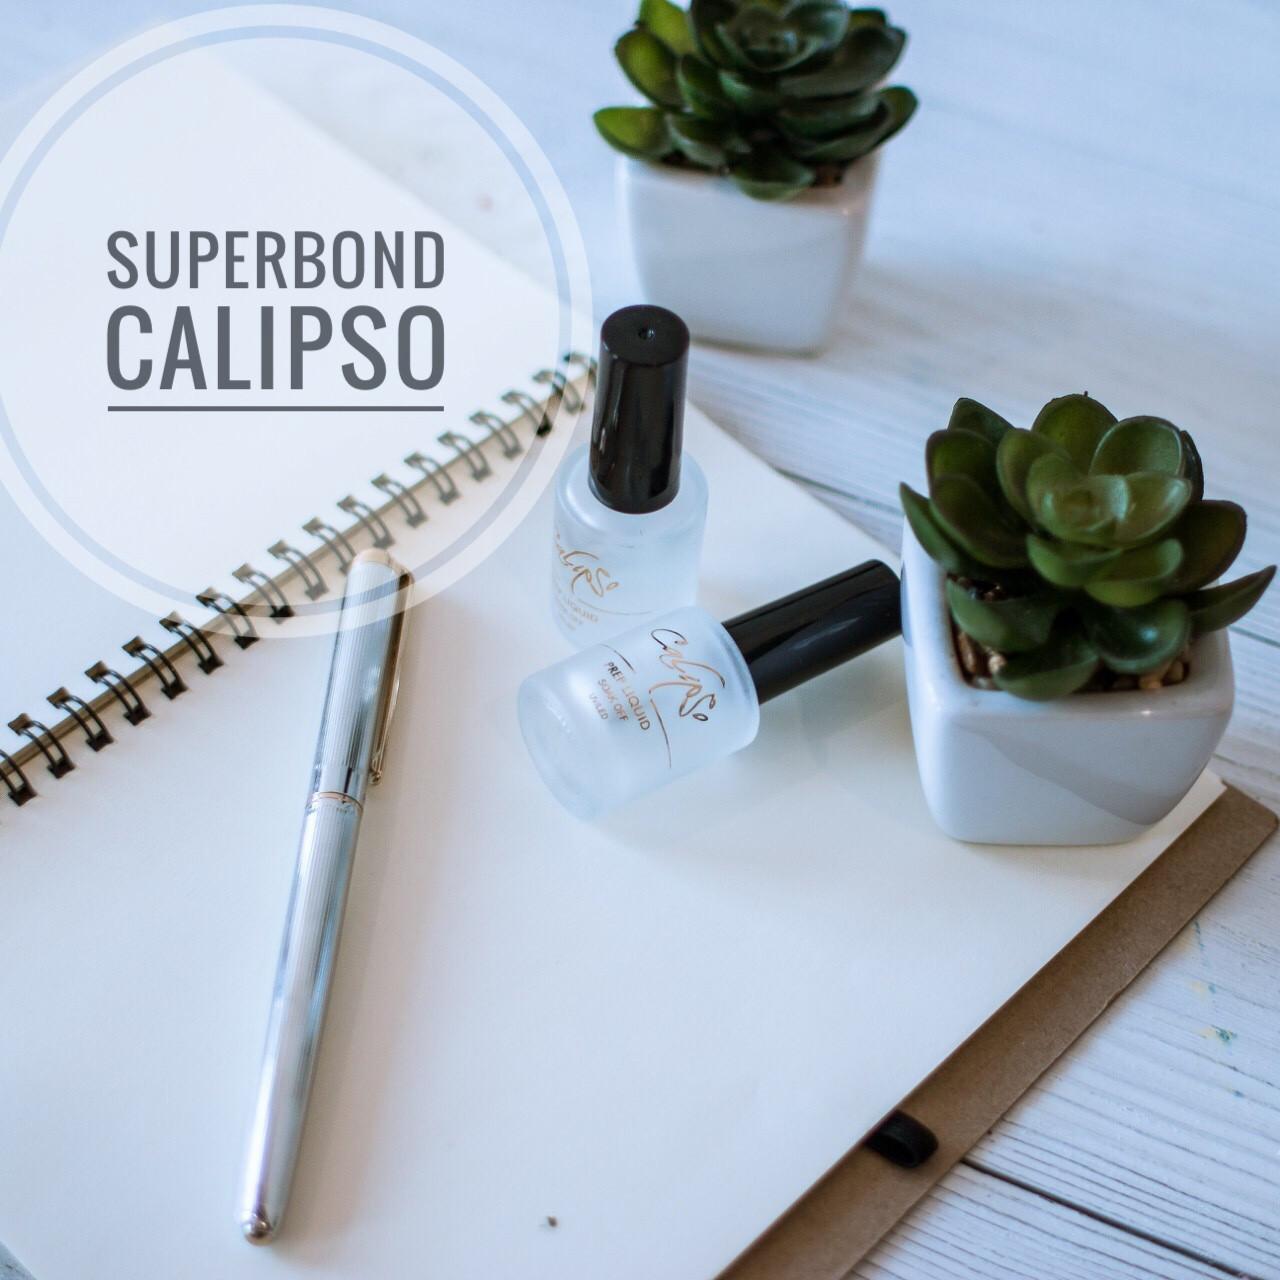 Ультрабонд Super Bond Calipso, 9 мл